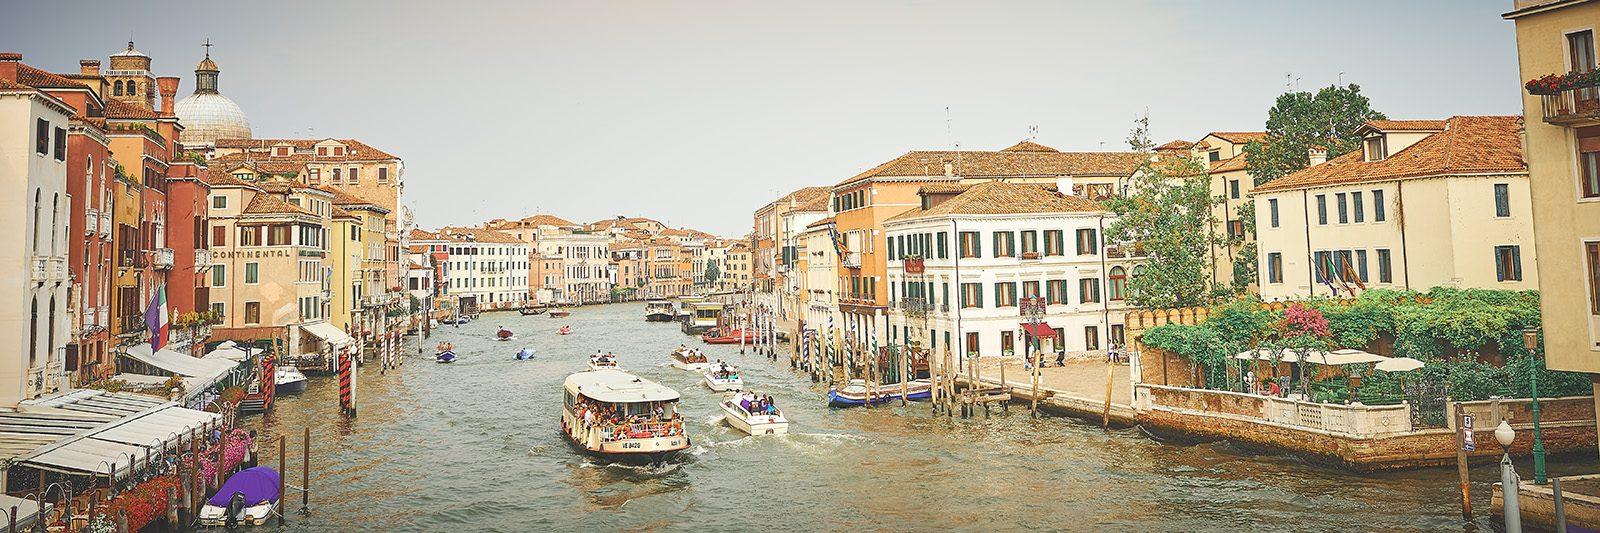 Turistbalje på Canal Grande av Peder Aaserud Eikeland